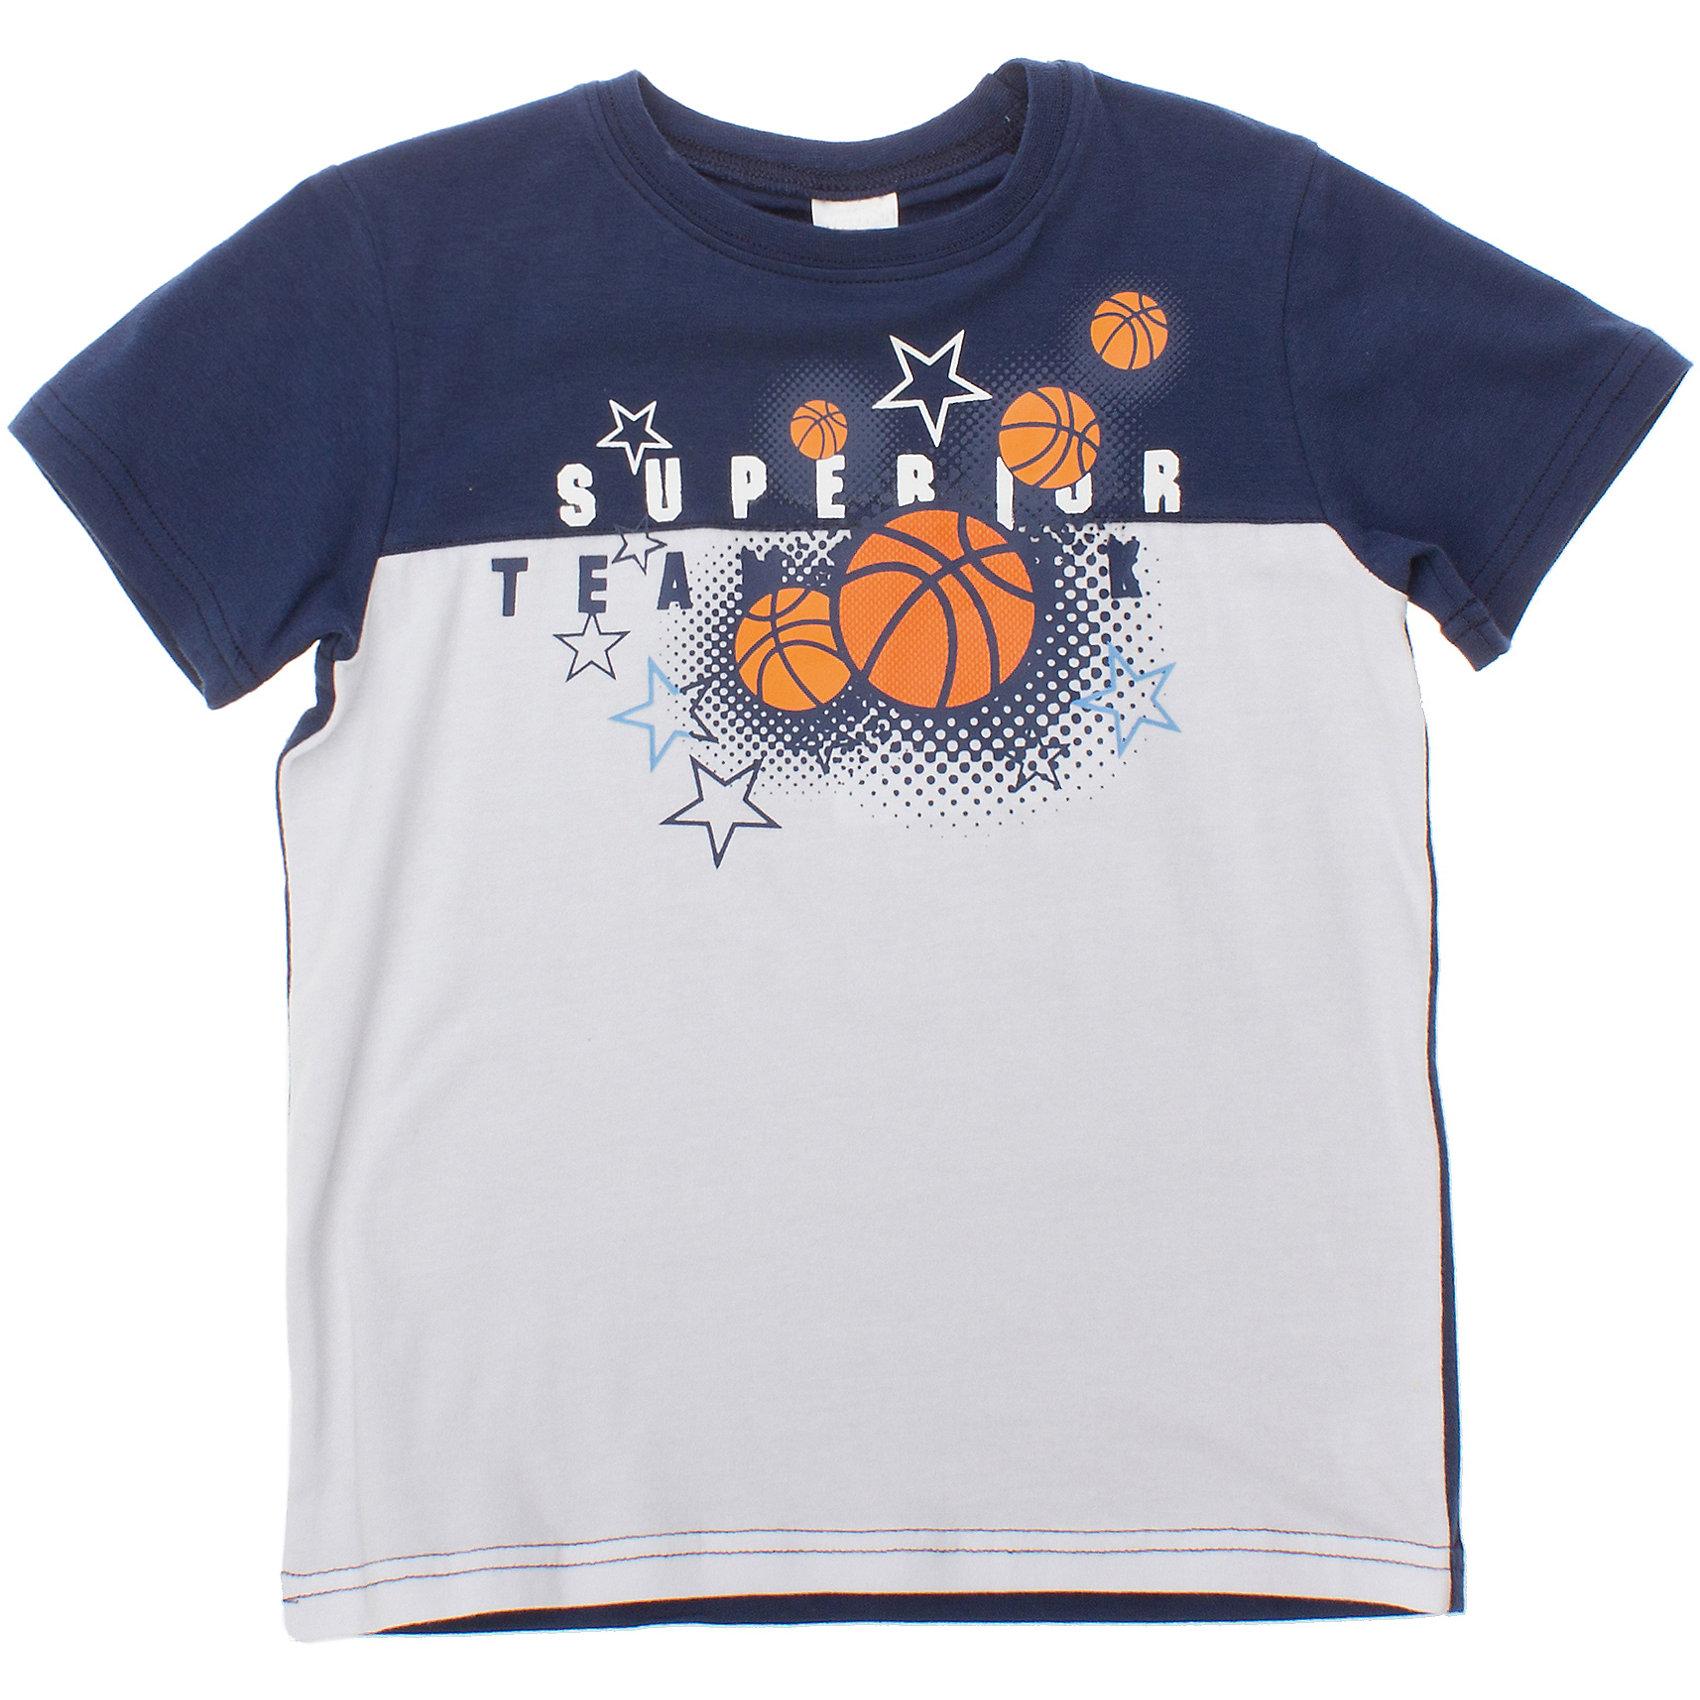 PlayToday Футболка для мальчика PlayToday футболка playtoday для мальчика цвет белый синий